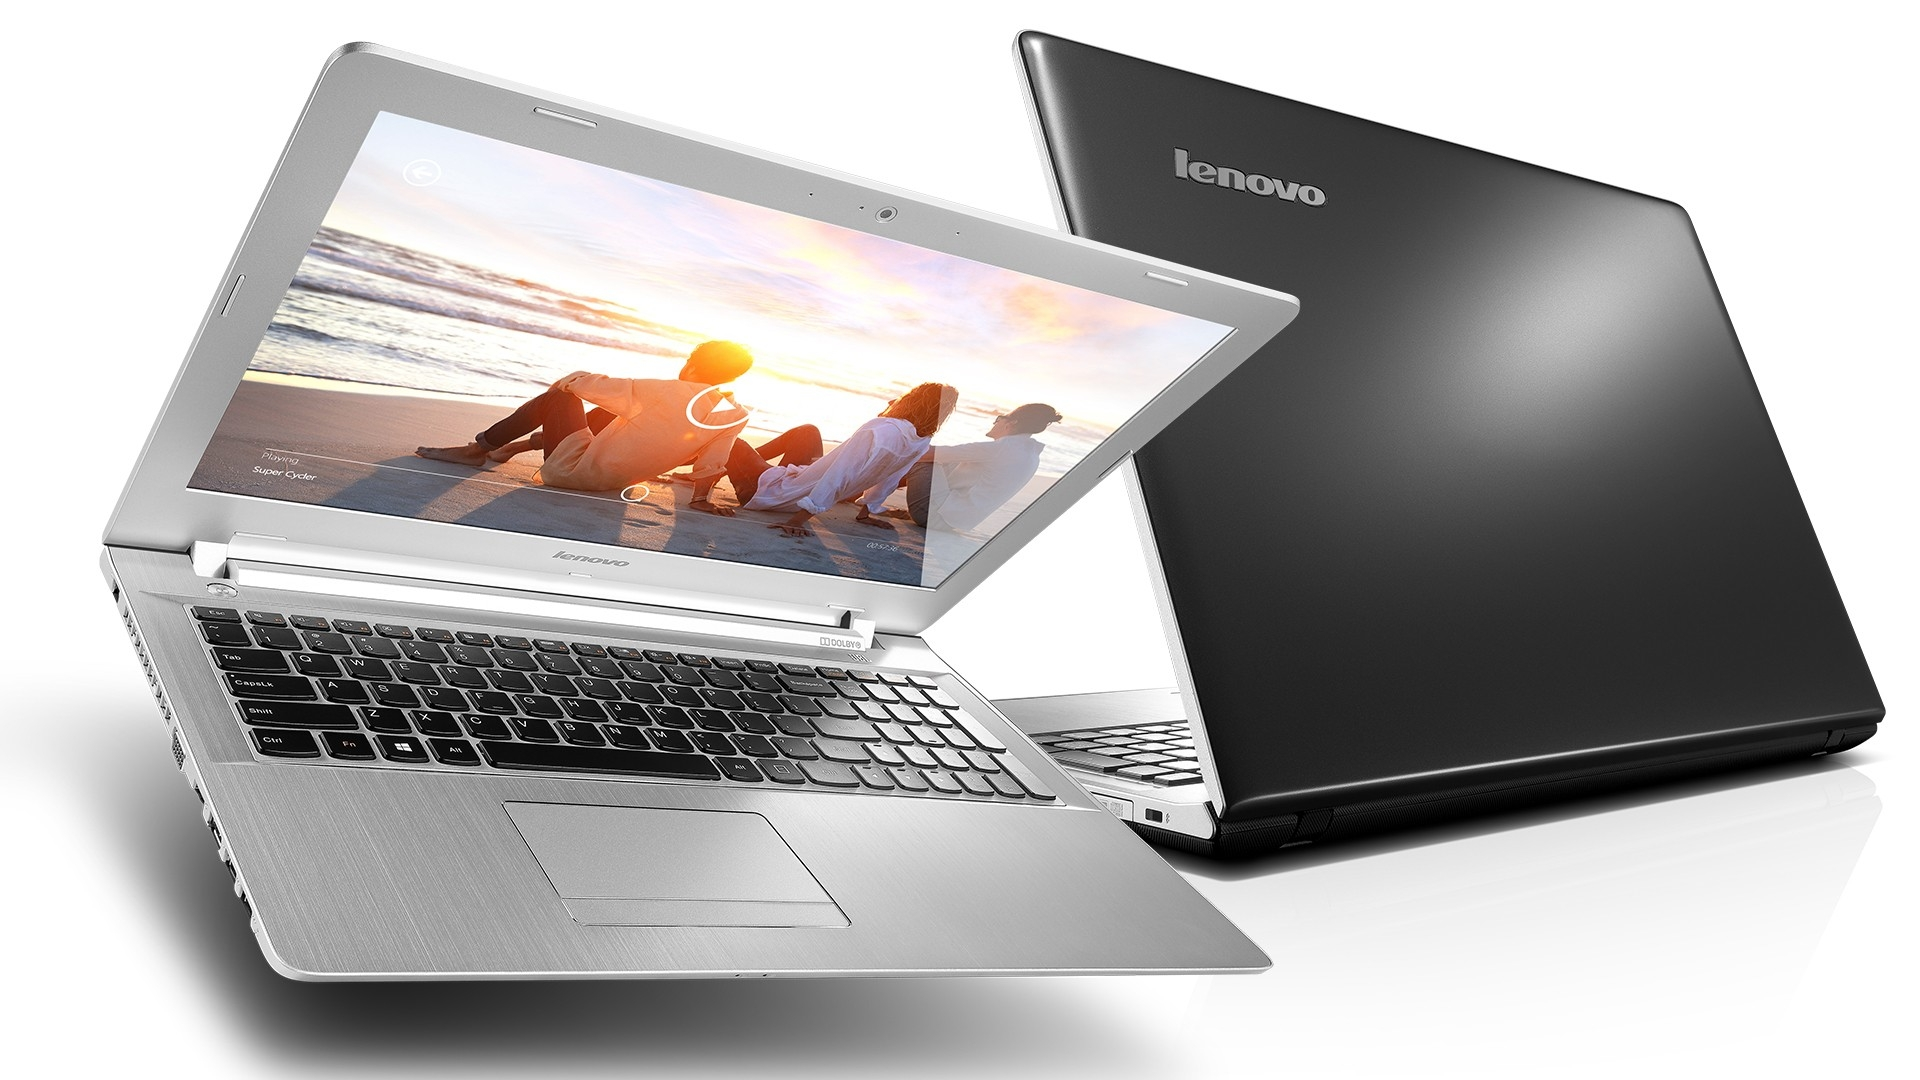 Lenovo Z51-70 لابتوب كور i7 جيل خامس مع كارت شاشة AMD R9 m375 أساسي 4 جيجا